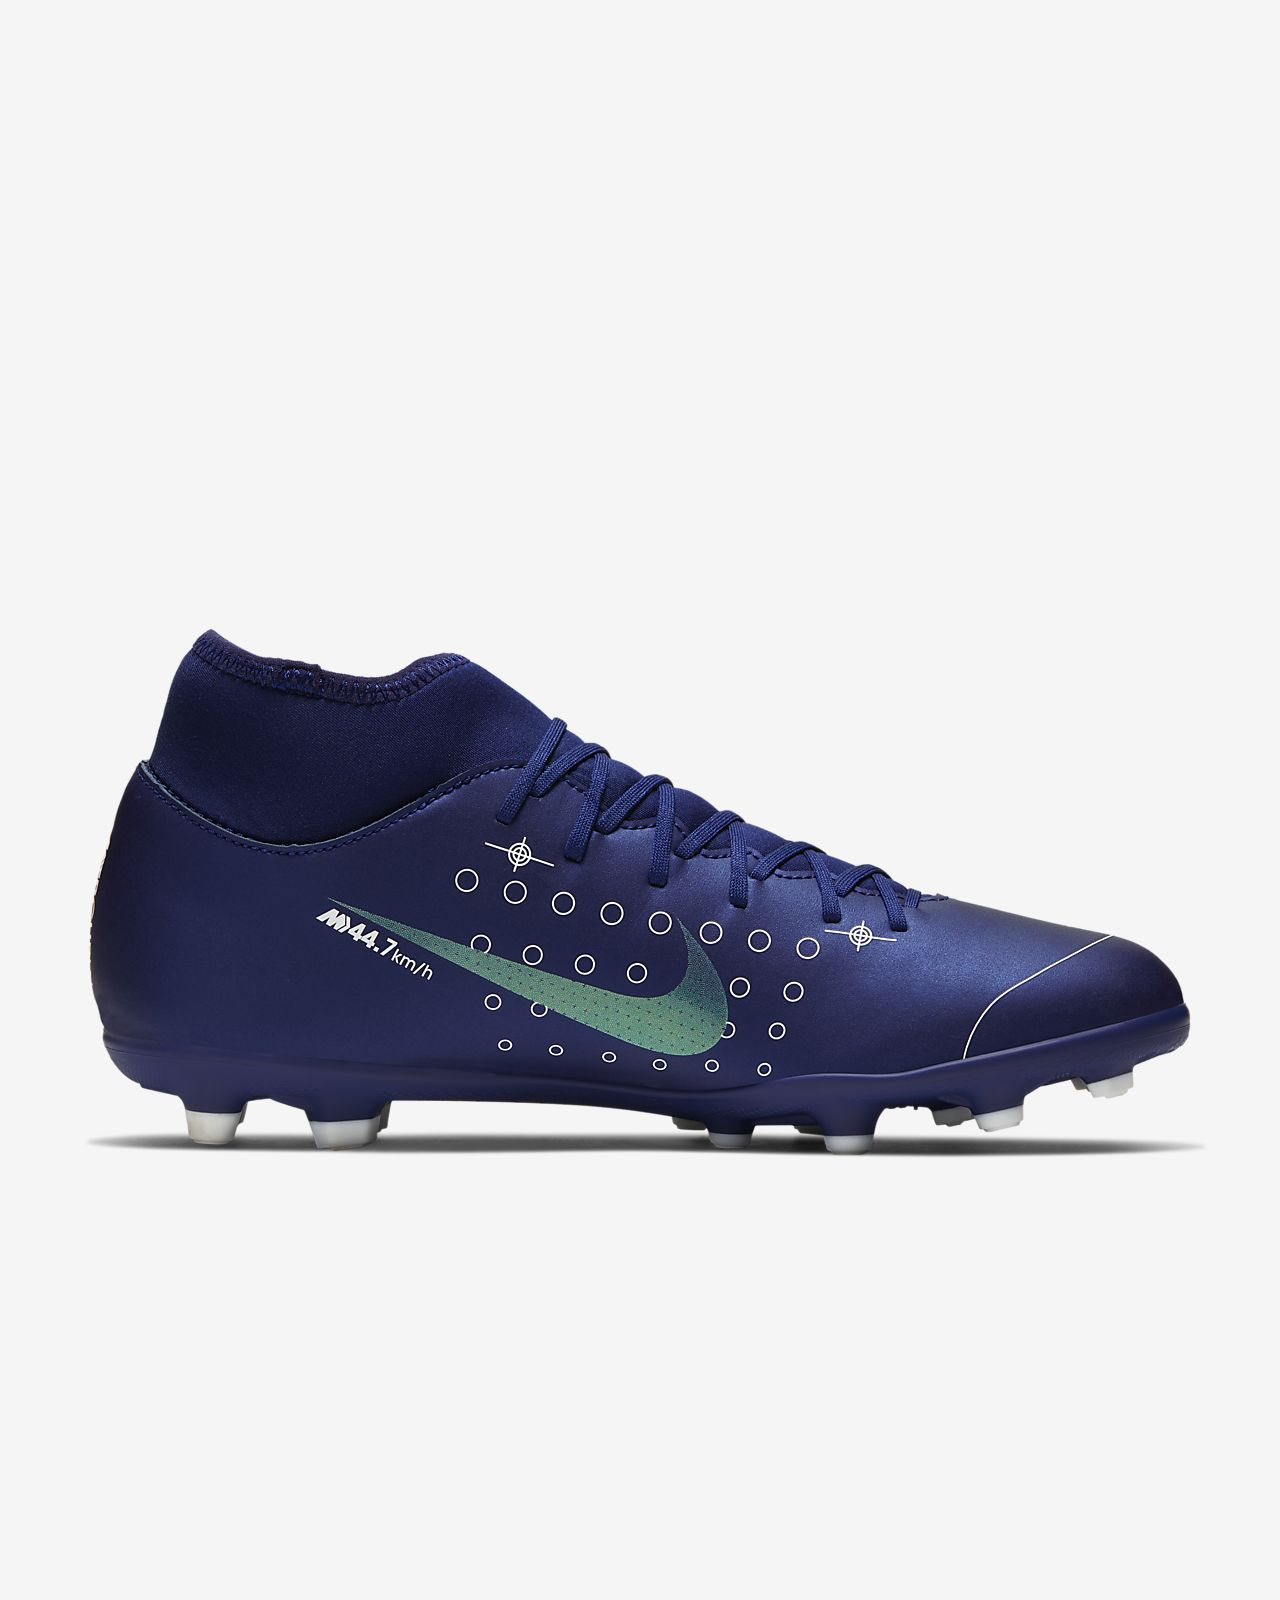 Scarpa da calcio multiterreno Nike Mercurial Superfly 7 Club MDS MG